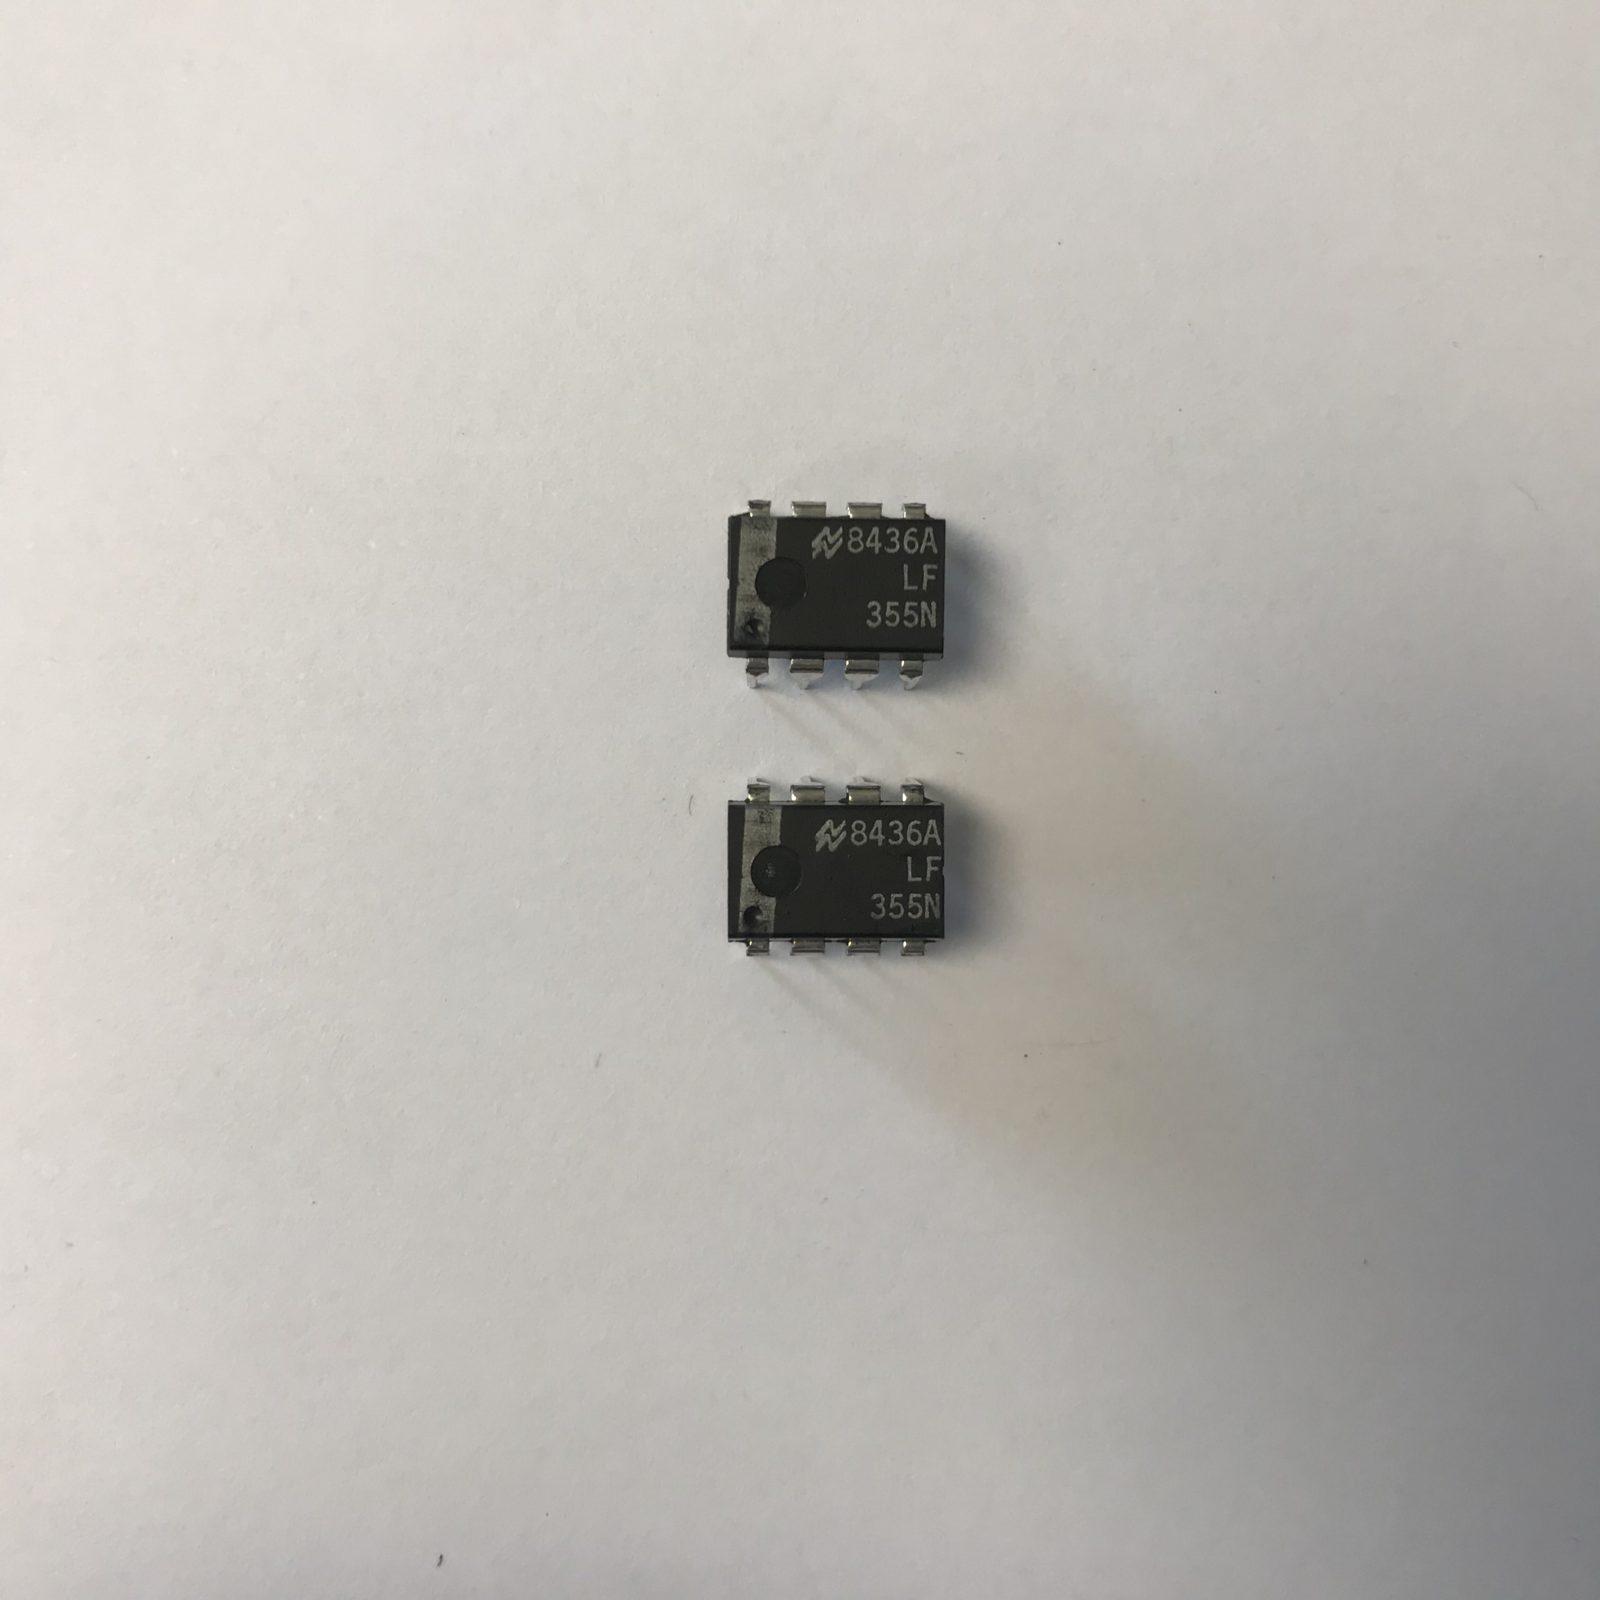 74LS245P 74LS245N MITSUBISHI DIP-20 IC x1PC